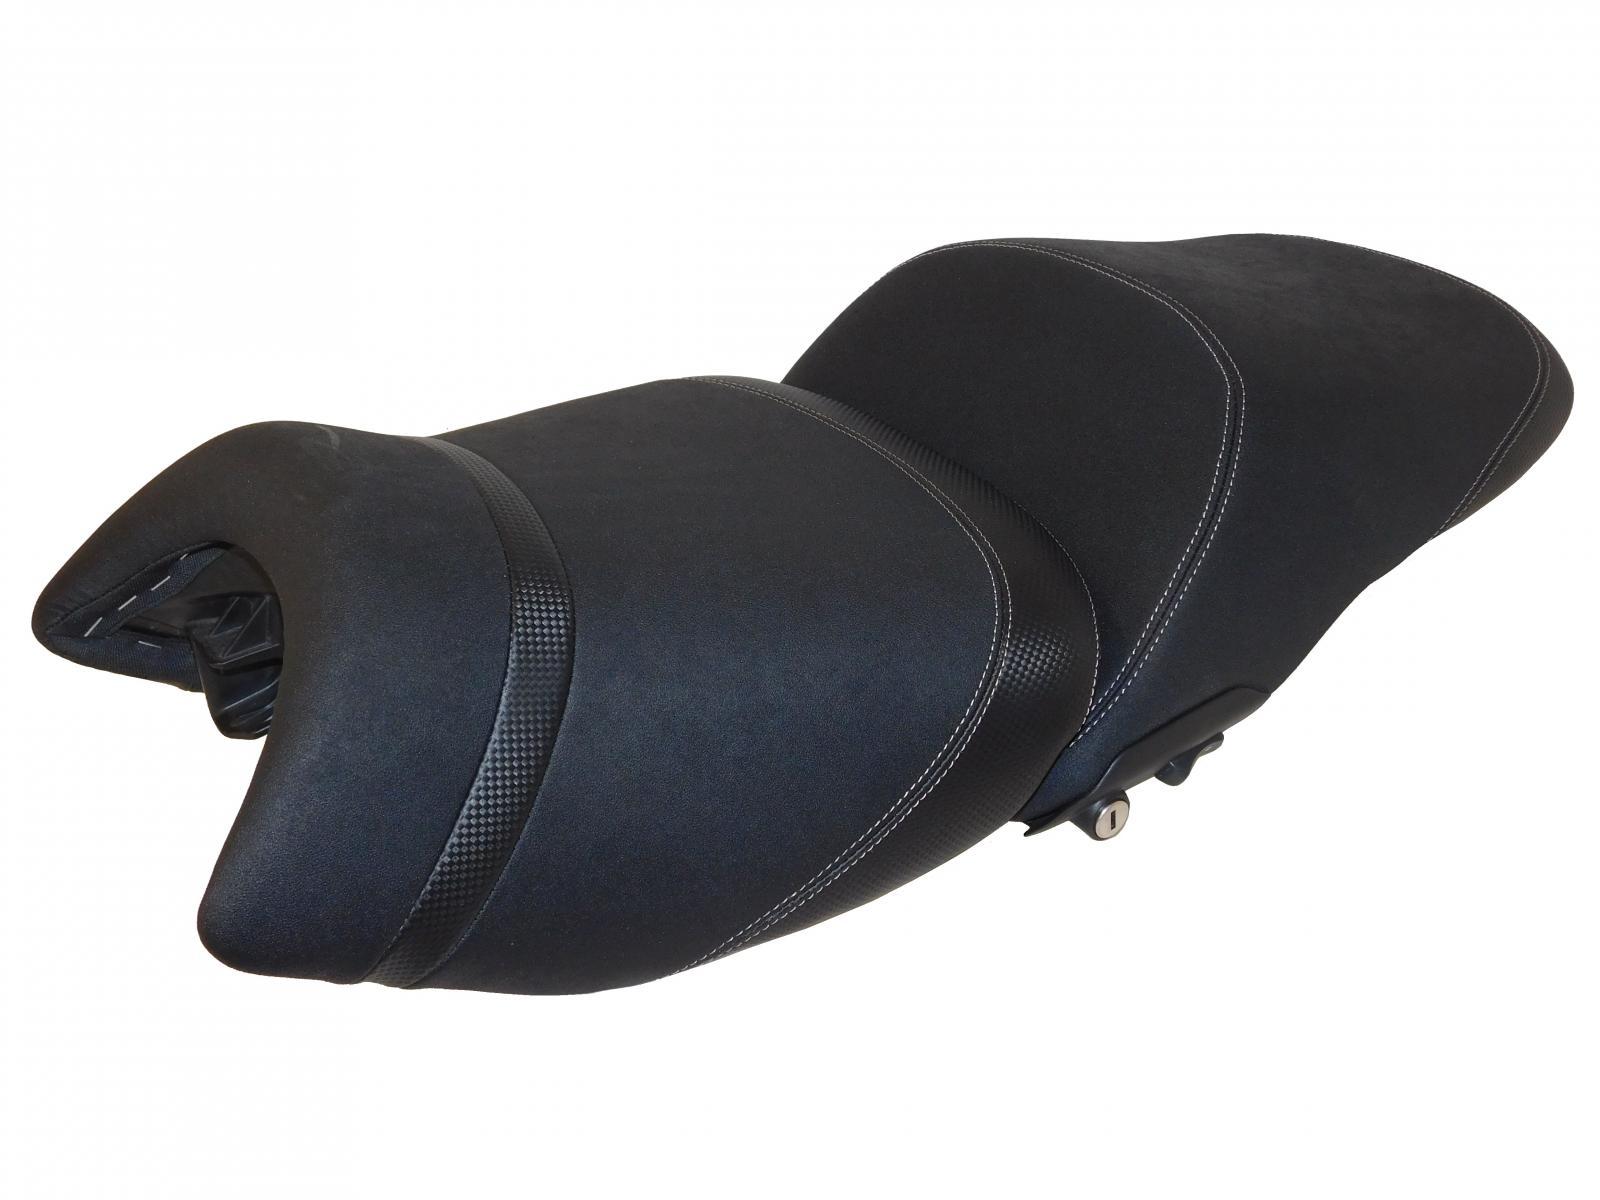 housse de selle design hsd4681 bmw k 1600 gt 2011 tarifs pour france. Black Bedroom Furniture Sets. Home Design Ideas